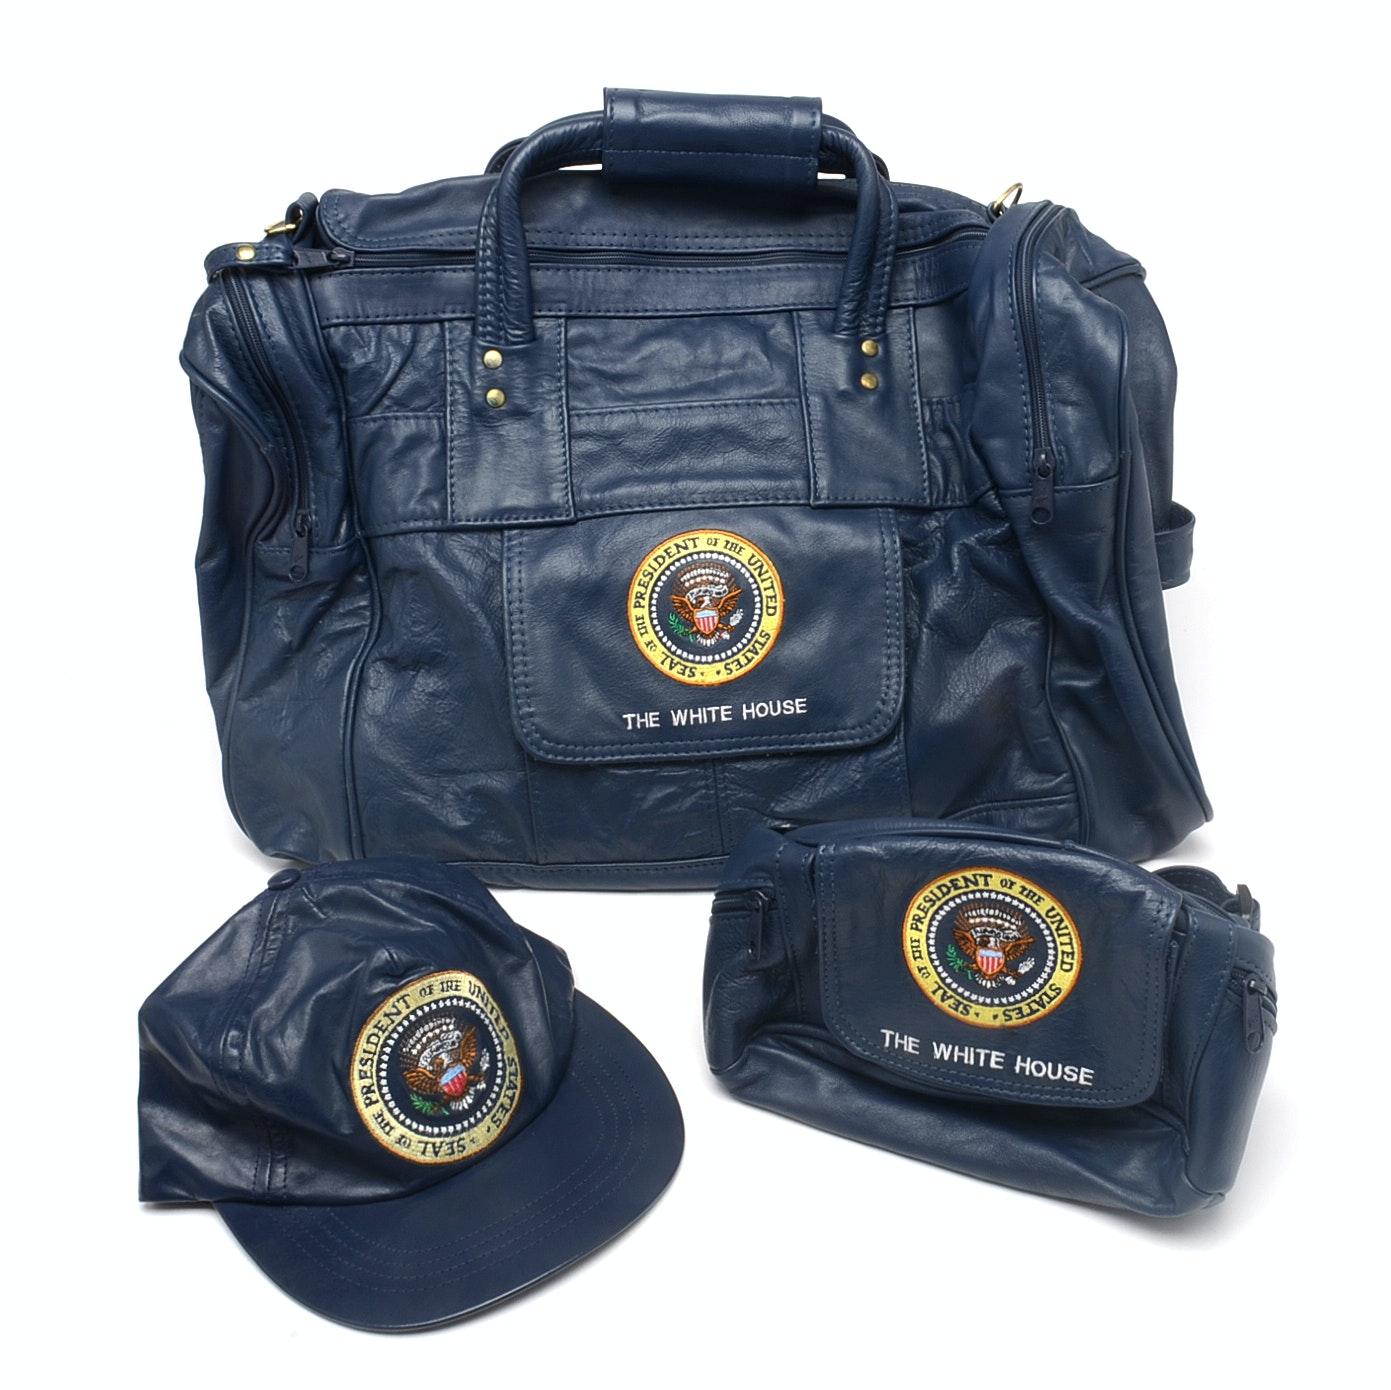 Collection of White House Memorabilia